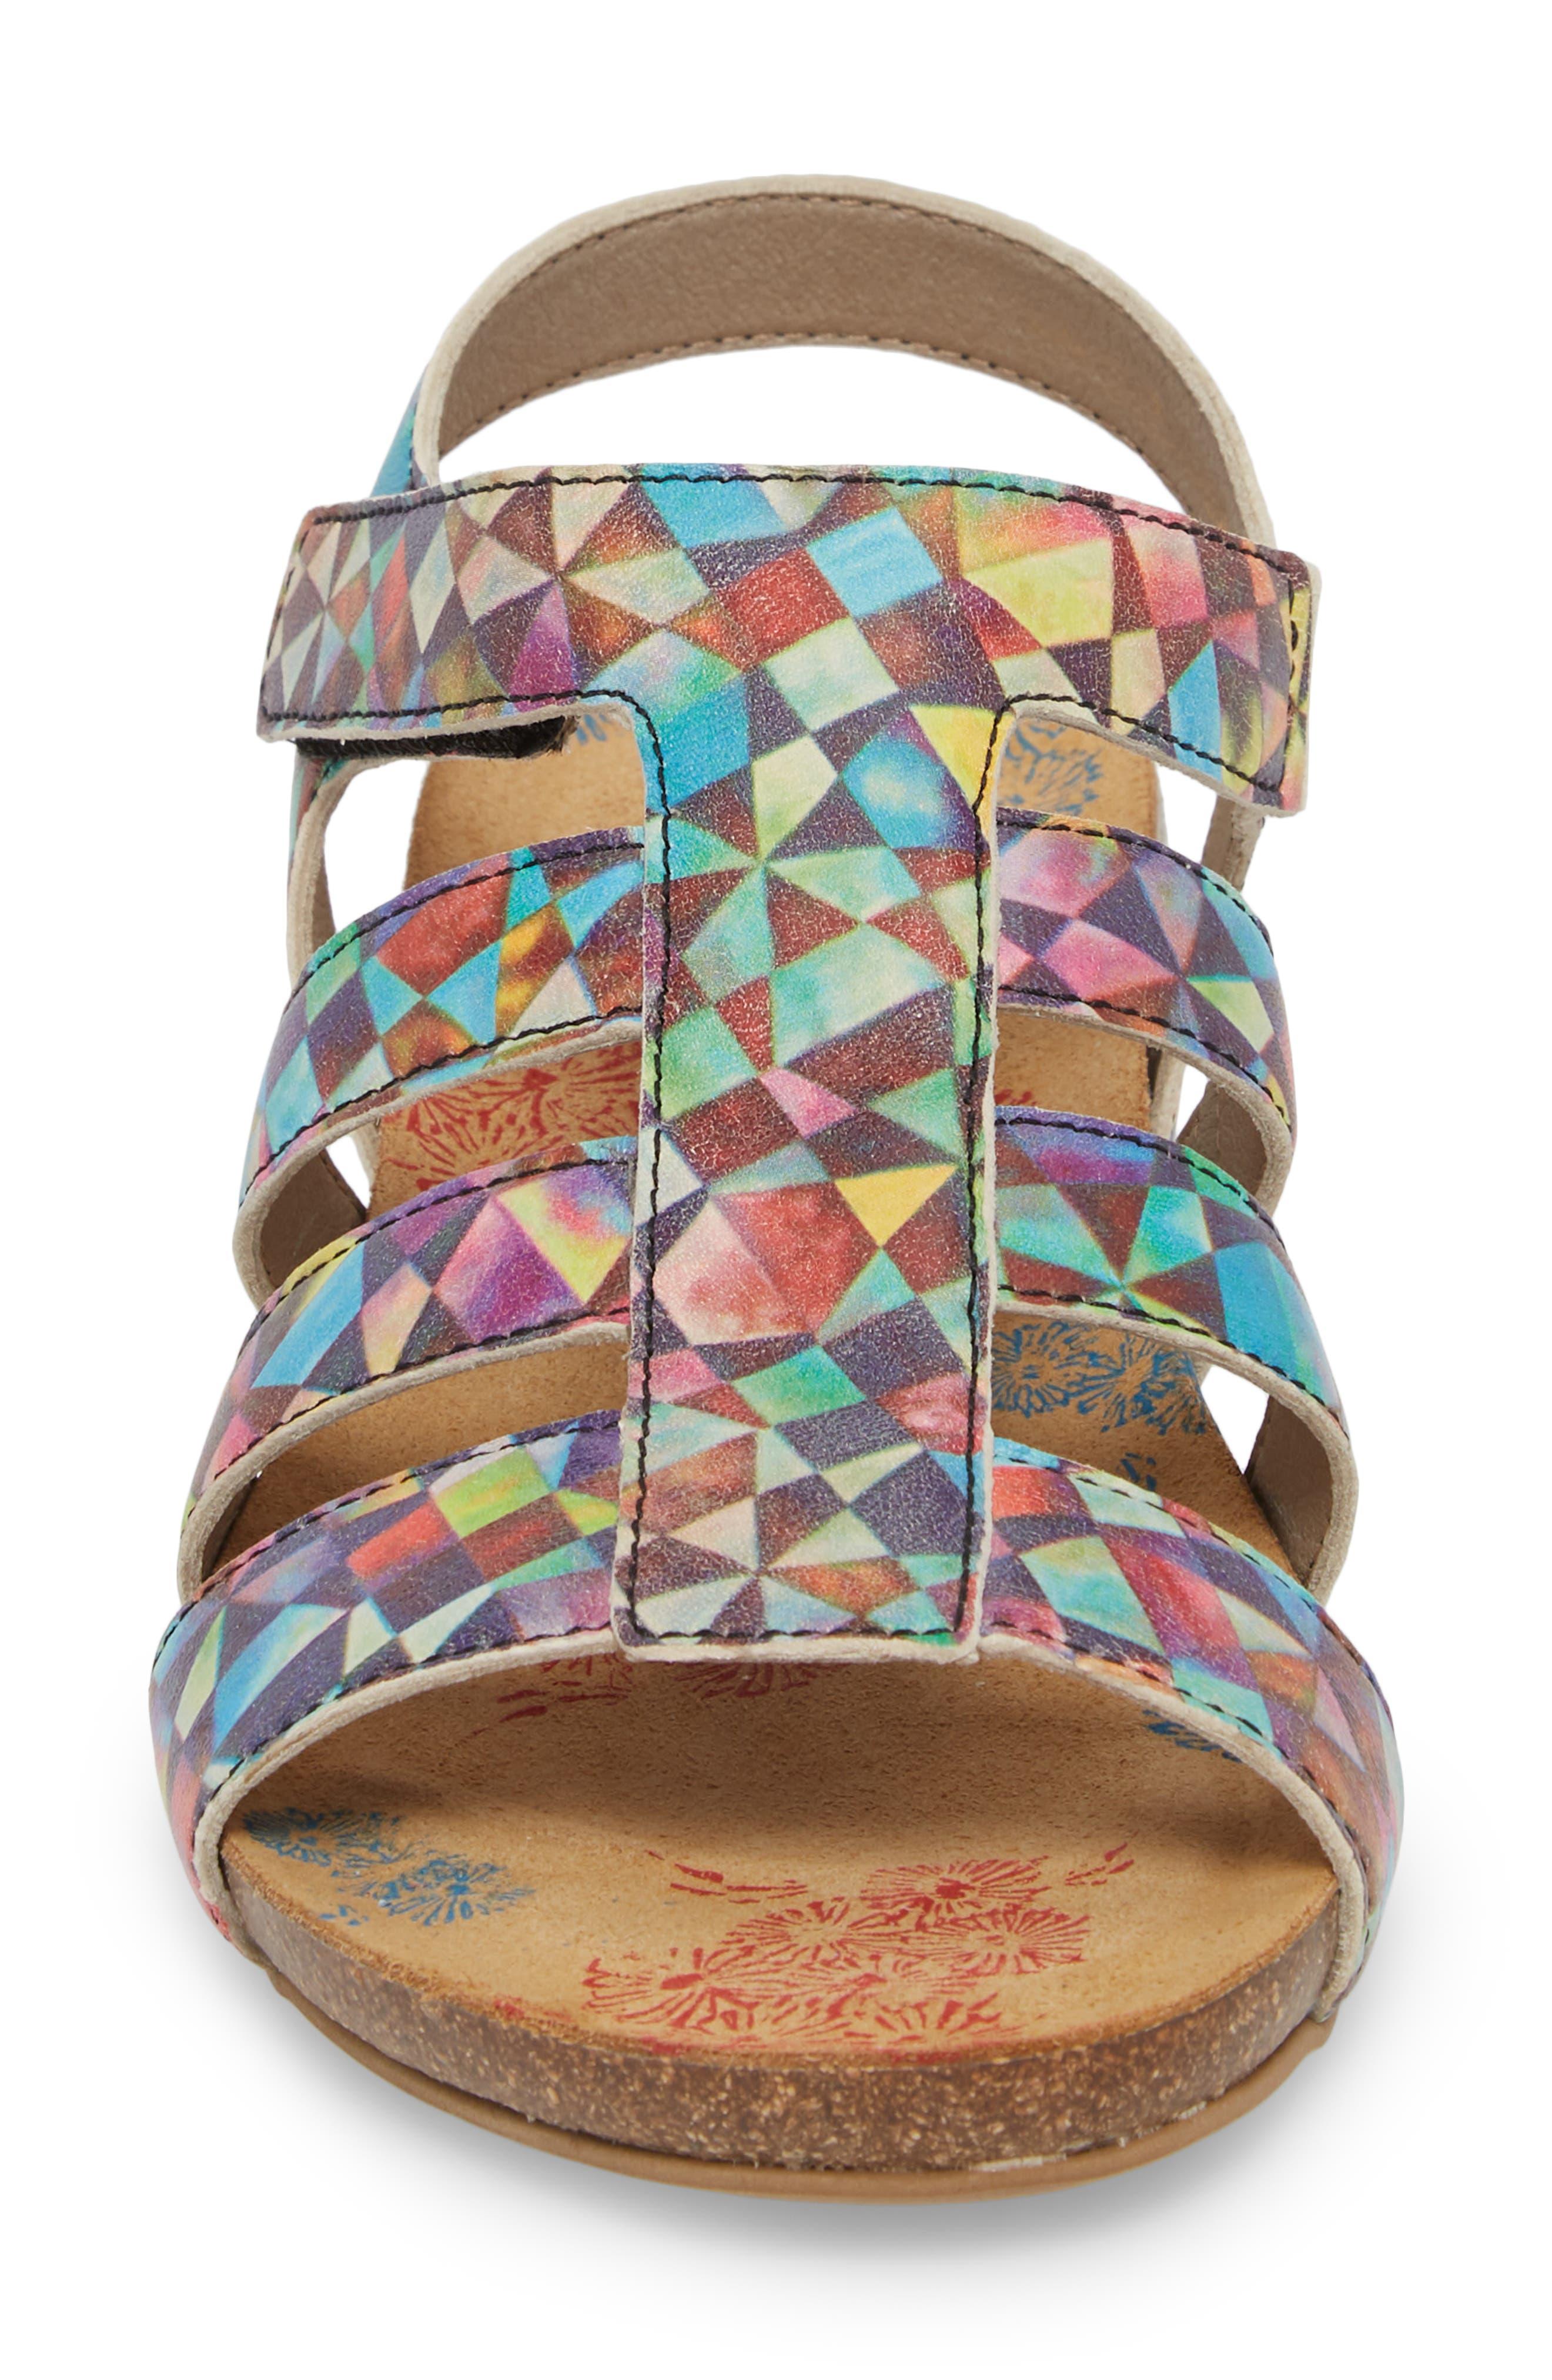 Delta Wedge Sandal,                             Alternate thumbnail 4, color,                             Mystere Leather